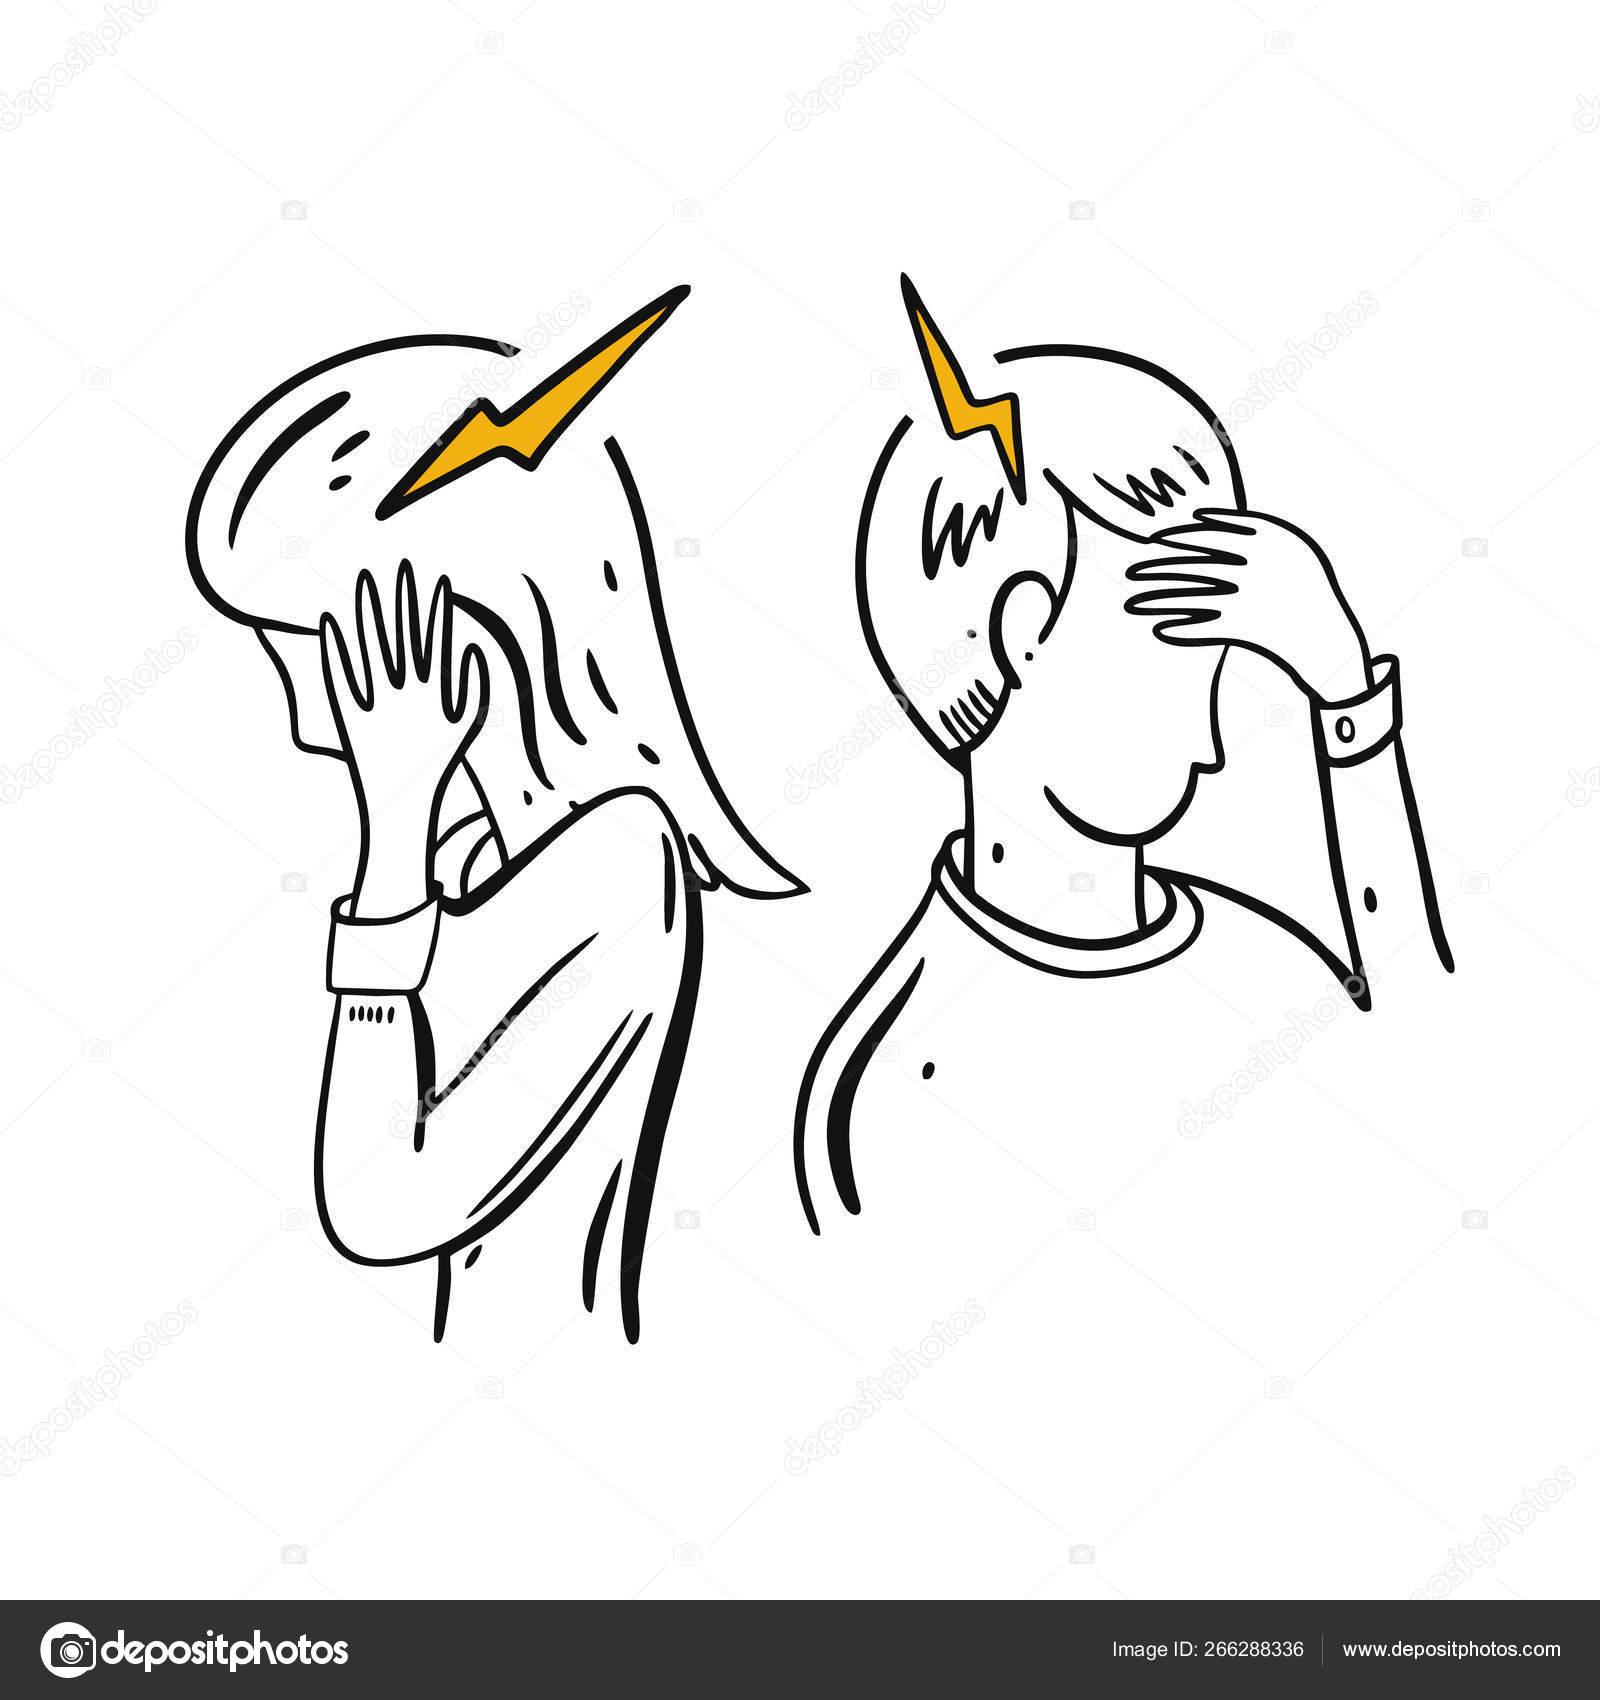 Headache Migraine Hand Drawn Vector Illustration Cartoon Style Stock Vector C Octyarb 266288336